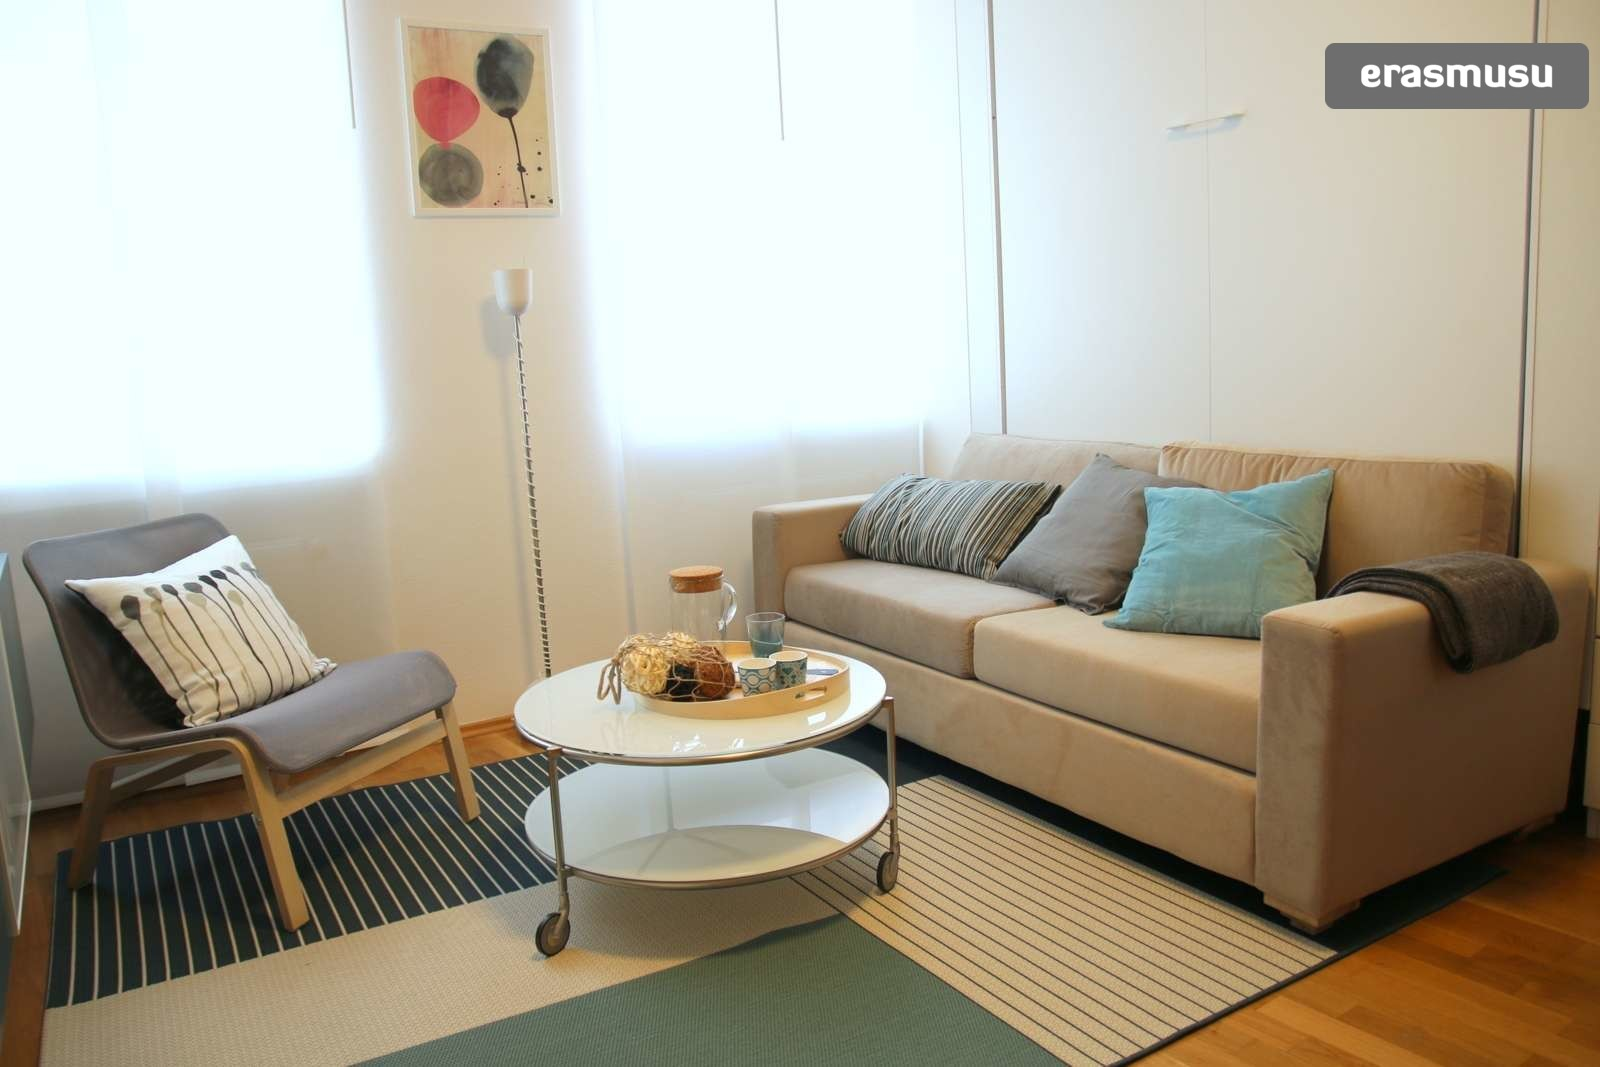 charming-studio-apartment-rent-wahring-77445fb4e943d6ae52fb27683